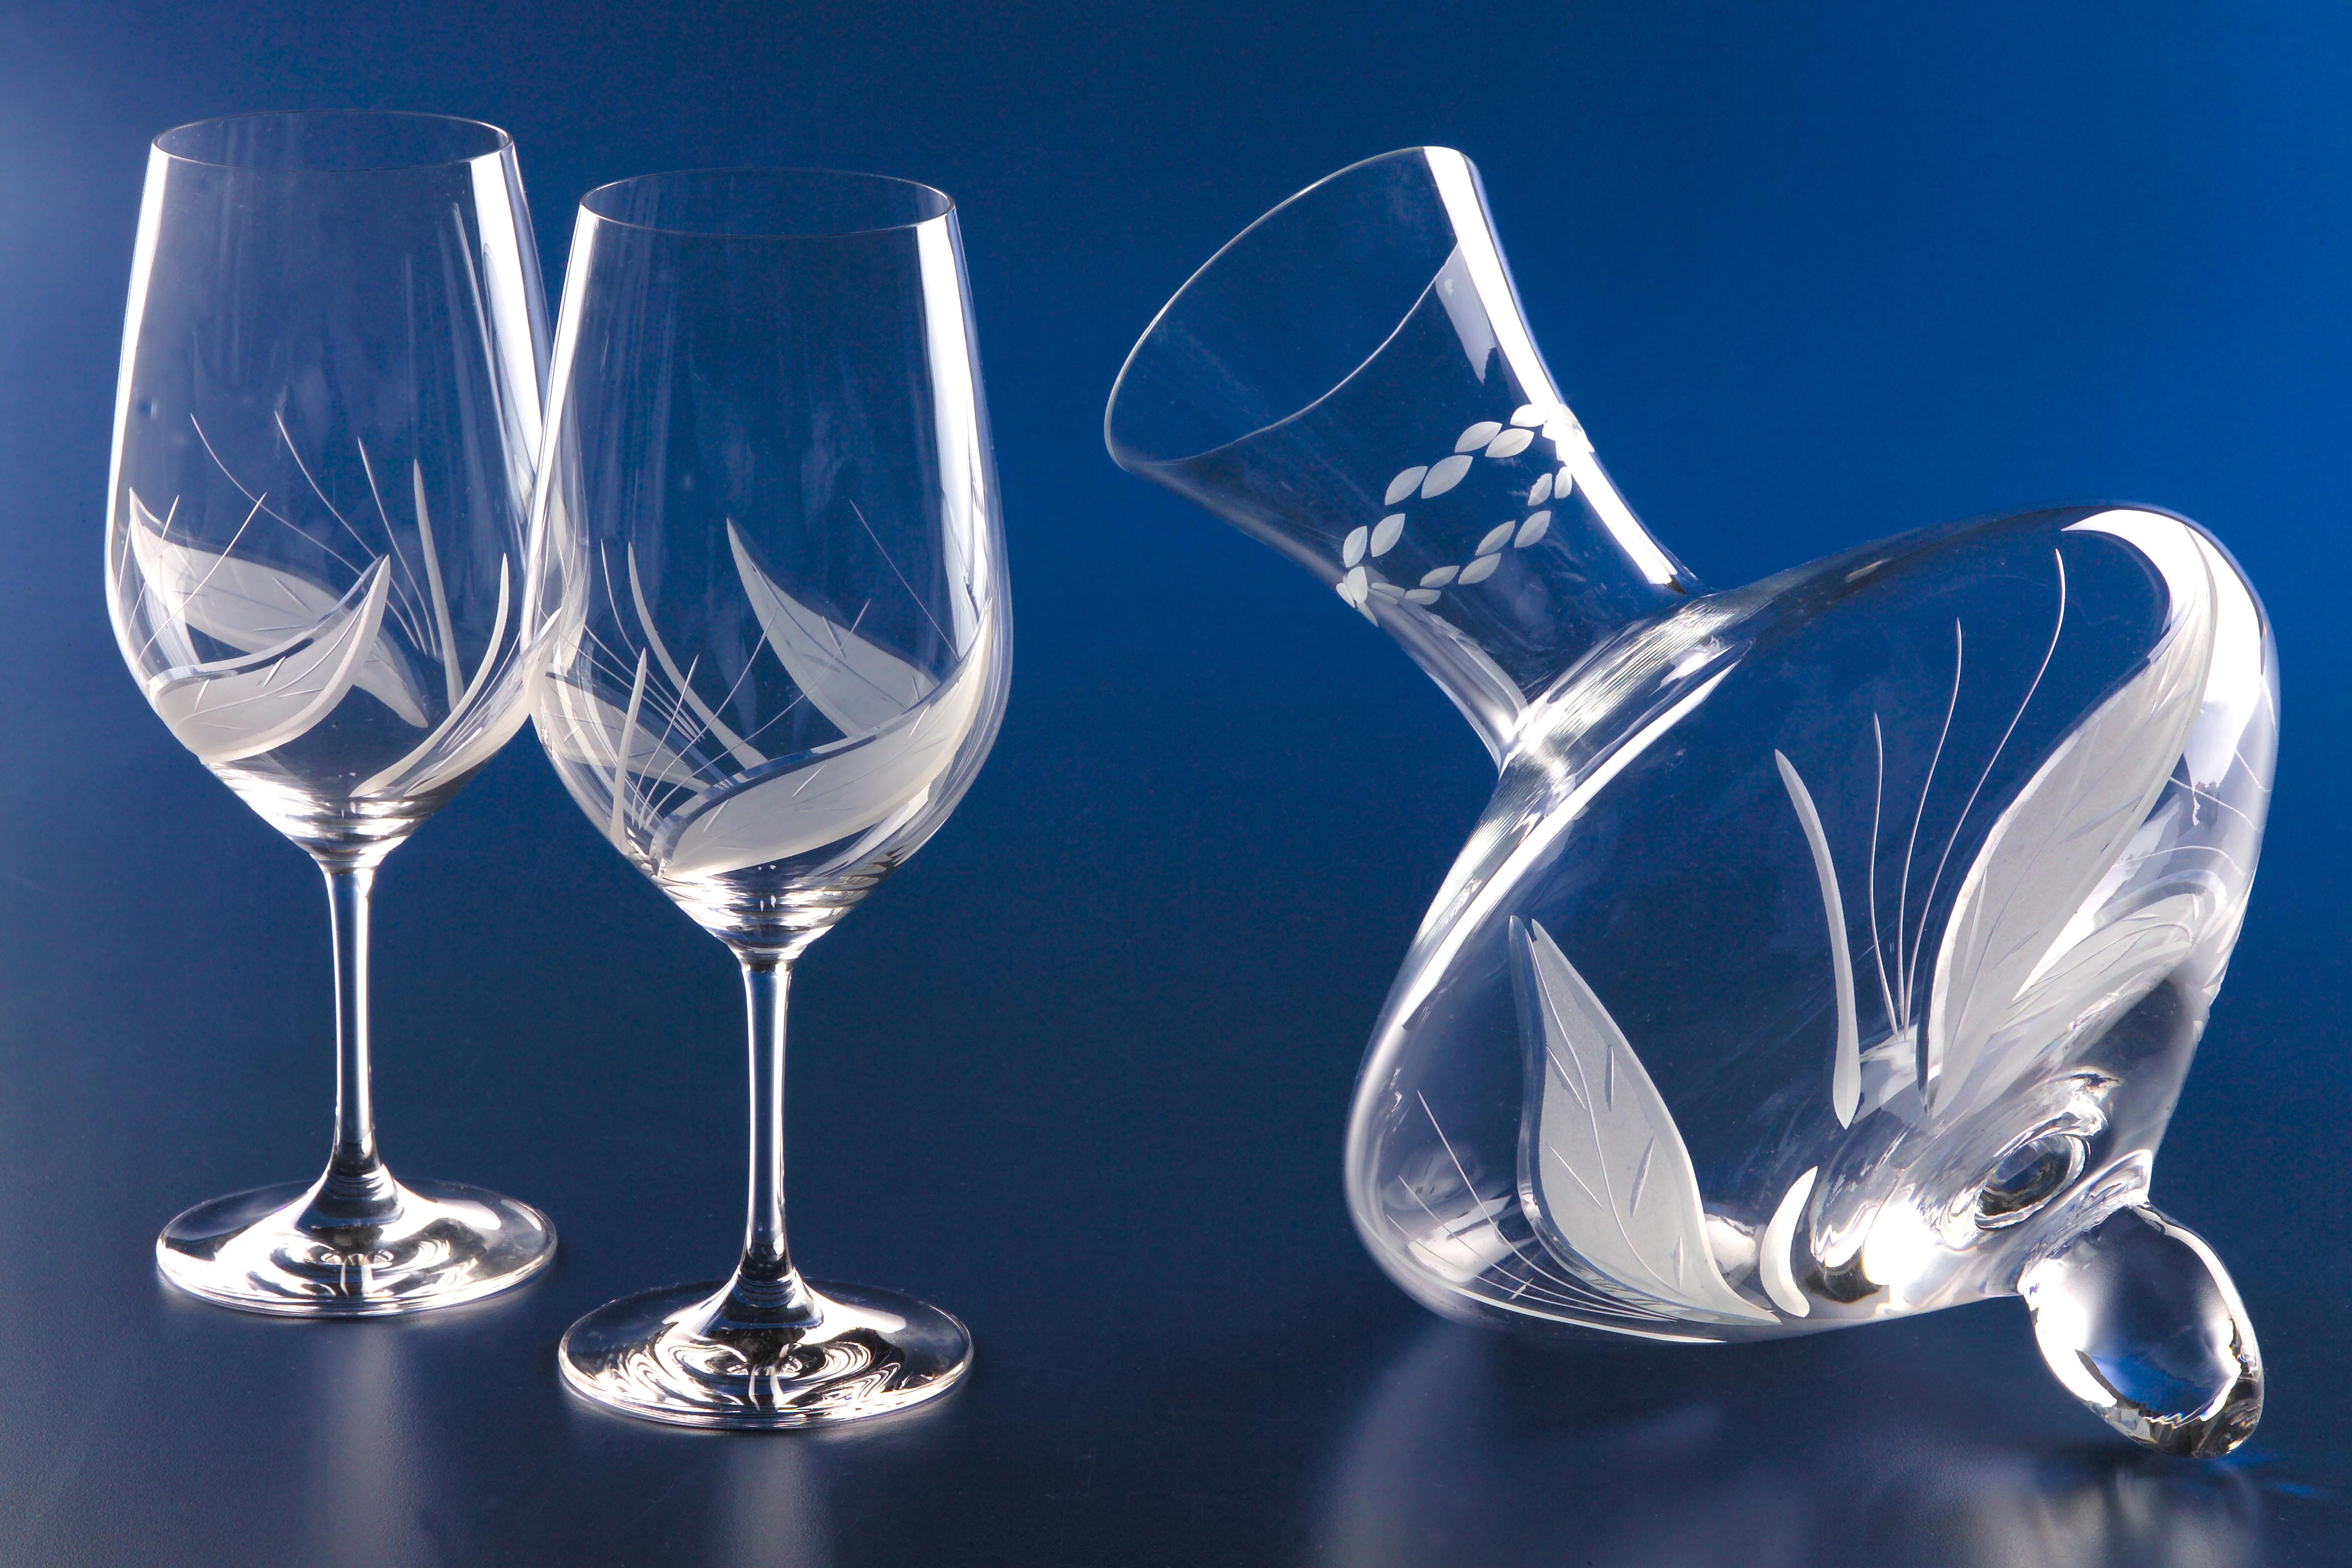 Cat logo oferta cristaler a juego de bar cristal - Cristalerias de bohemia ...